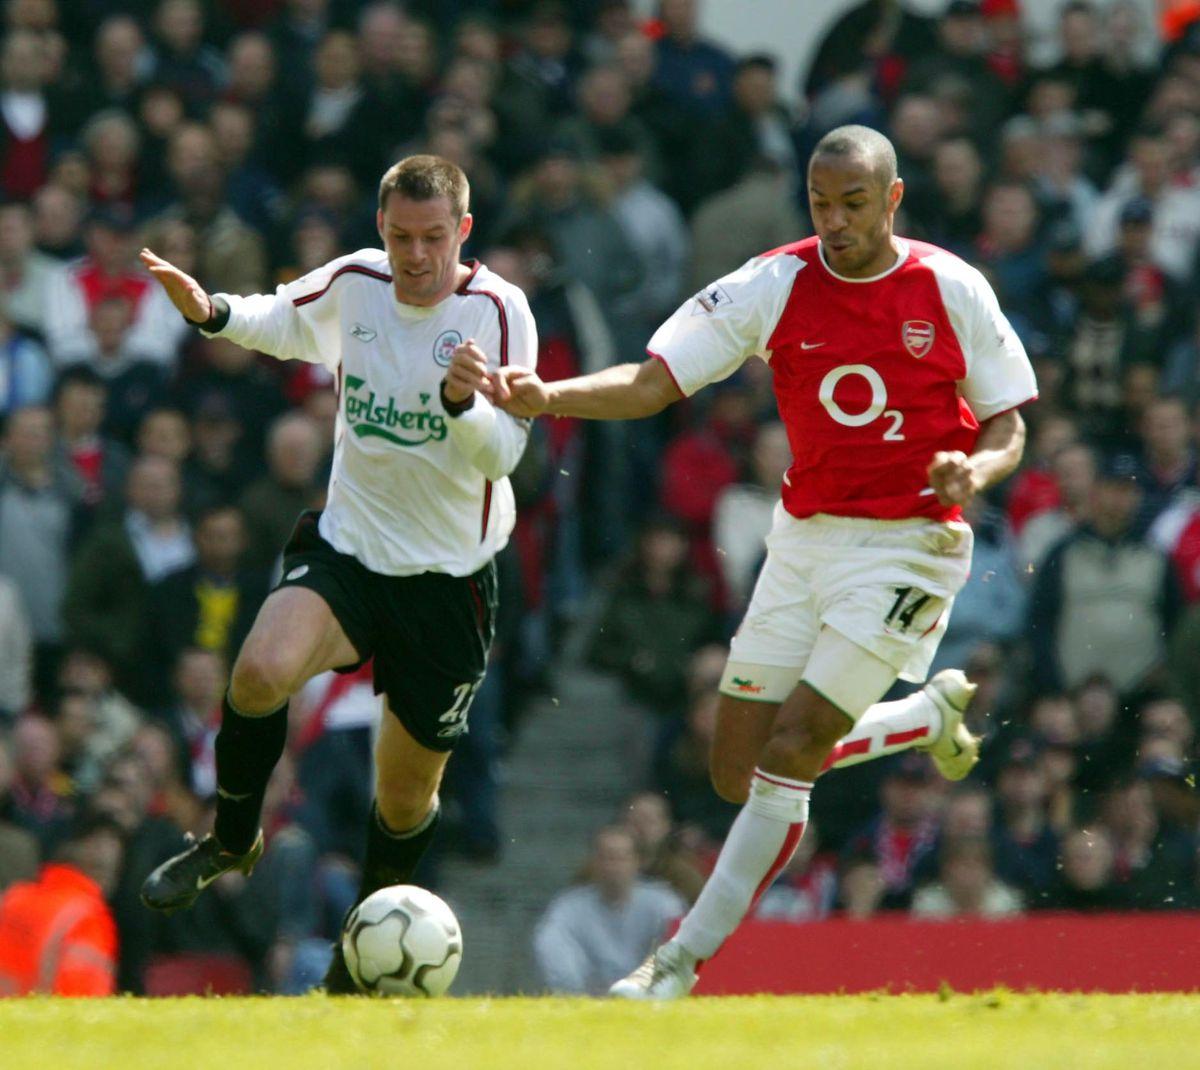 Soccer - FA Barclaycard Premiership - Arsenal v Liverpool